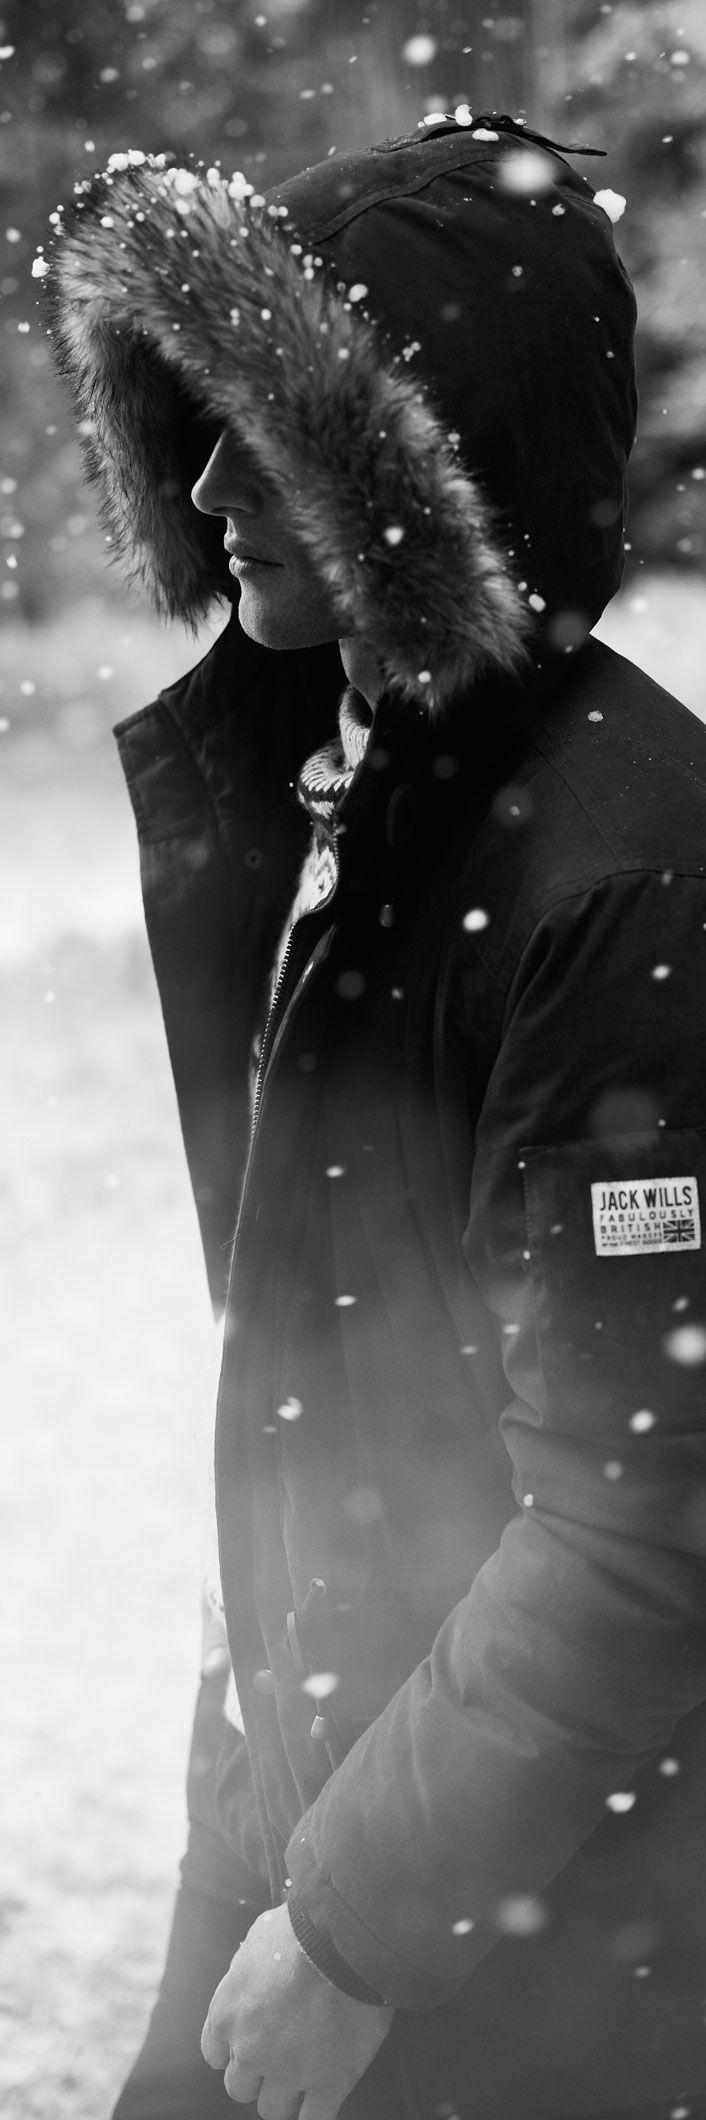 Mens Outerwear | Gilets, Jackets, Coats, Blazers & Parkas | Jack Wills